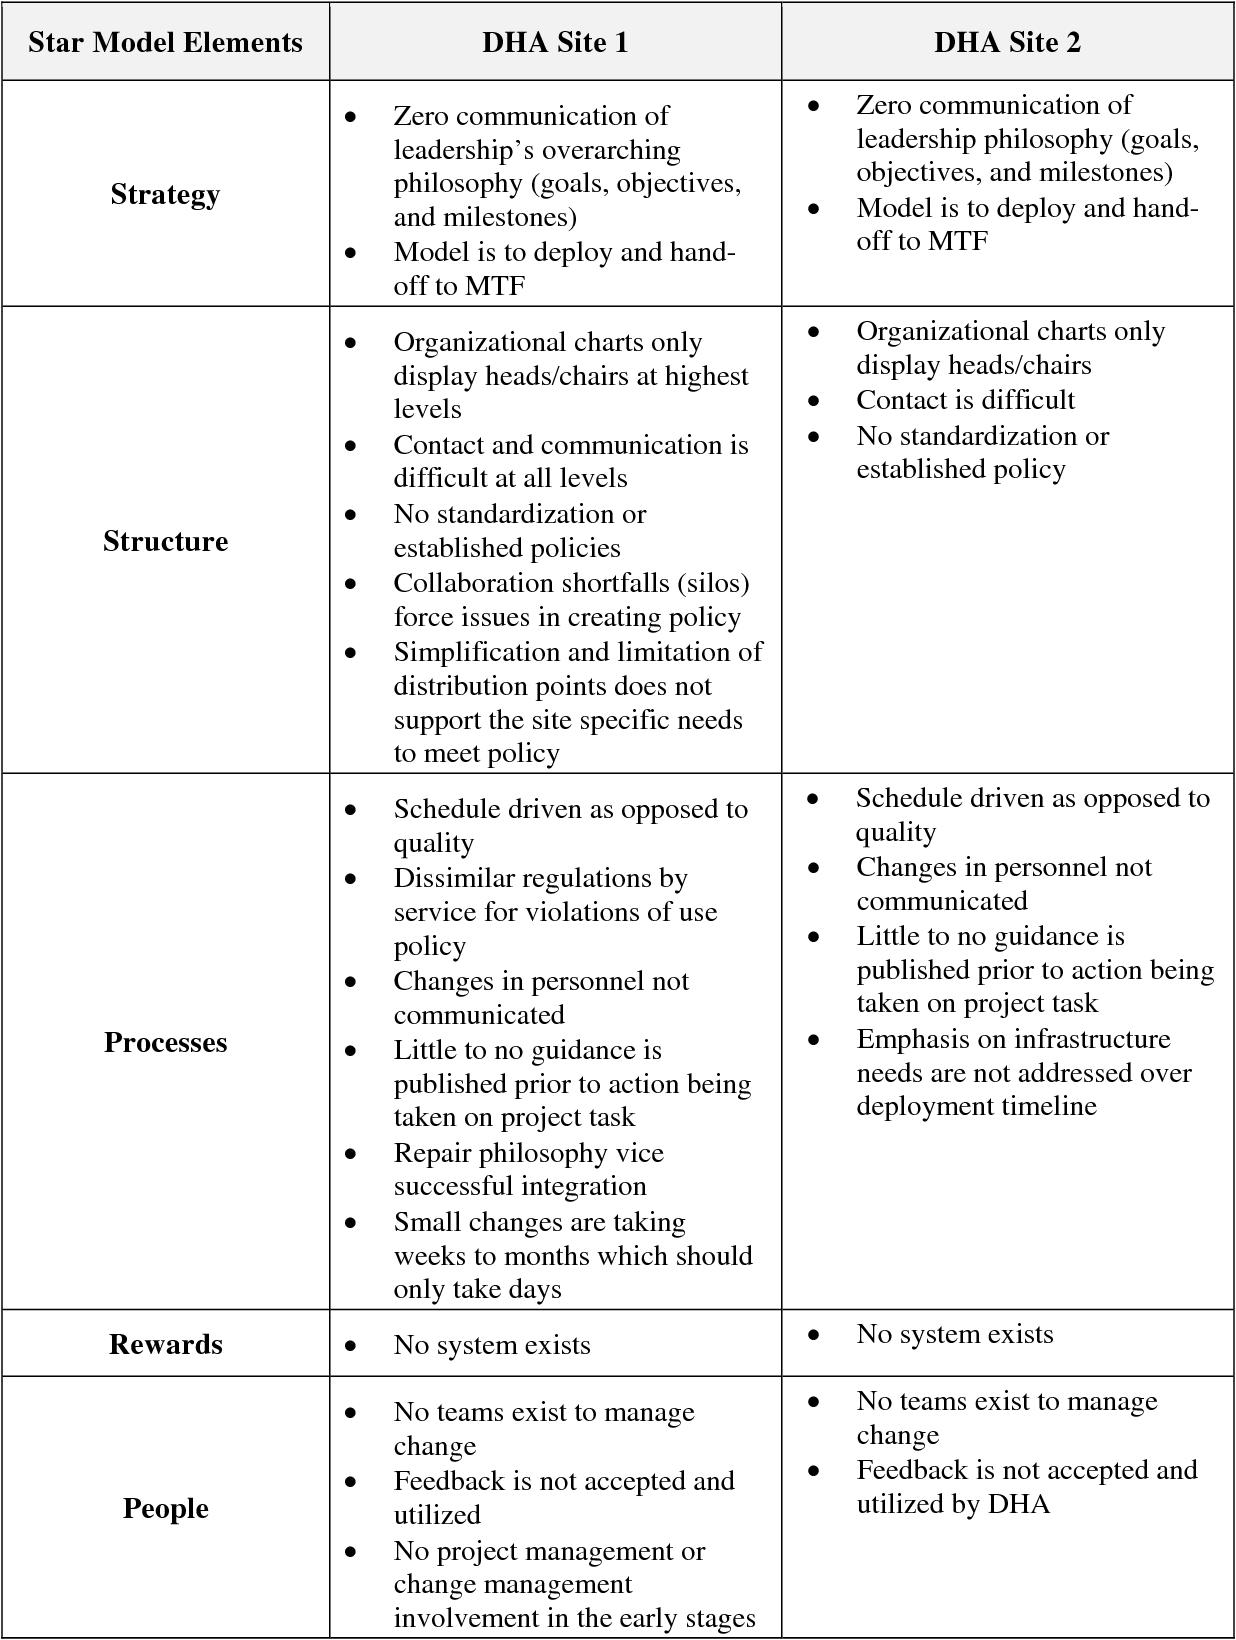 Defense Health Agency Organizational Chart Trinity